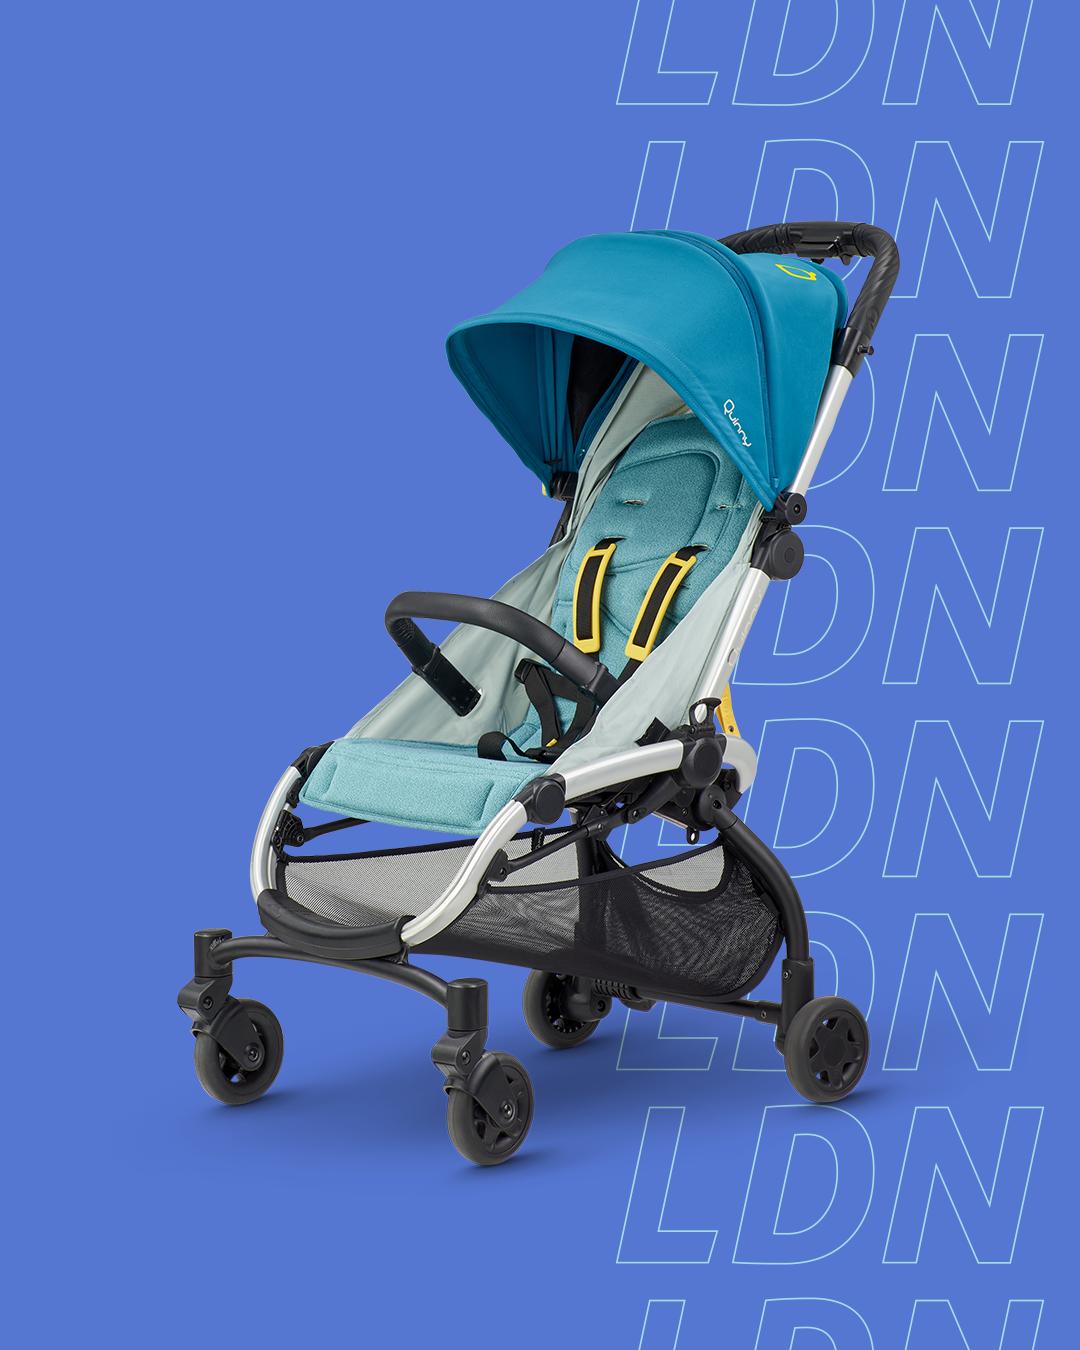 Quinny LDN in 2020 Quinny stroller, Quinny, Stroller